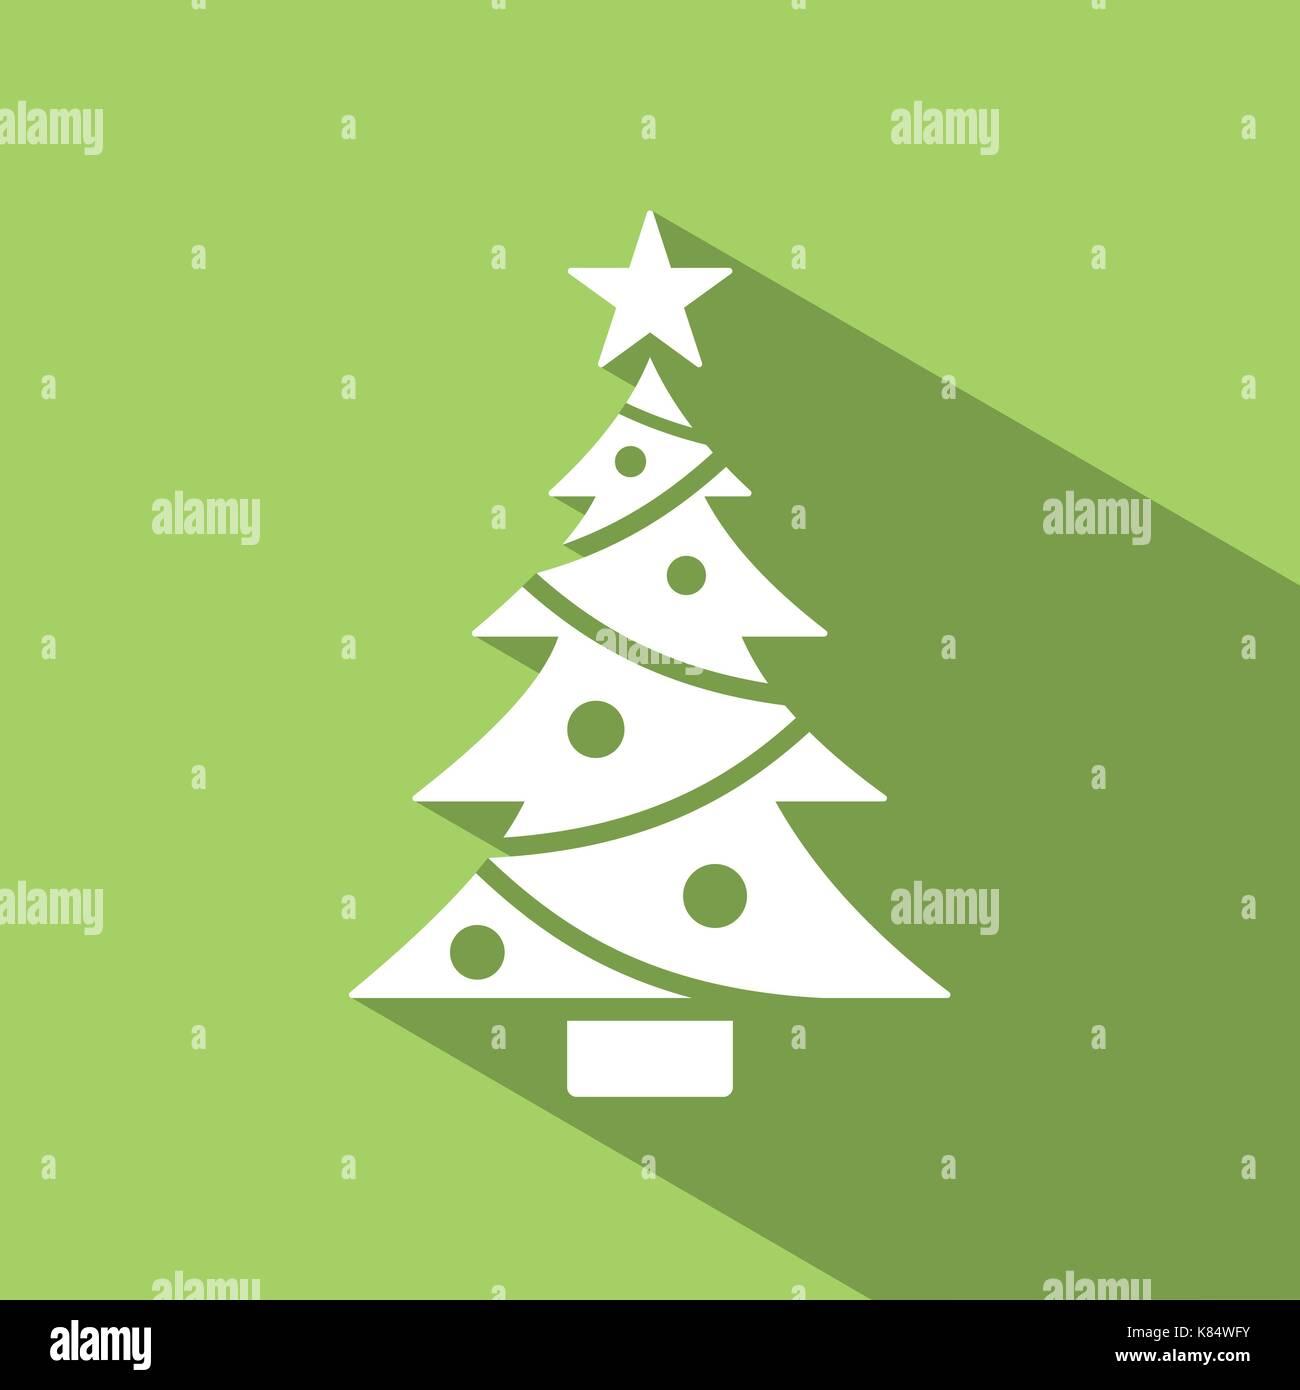 Christmas Tree Vector Vectors Stock Photos & Christmas Tree Vector ...